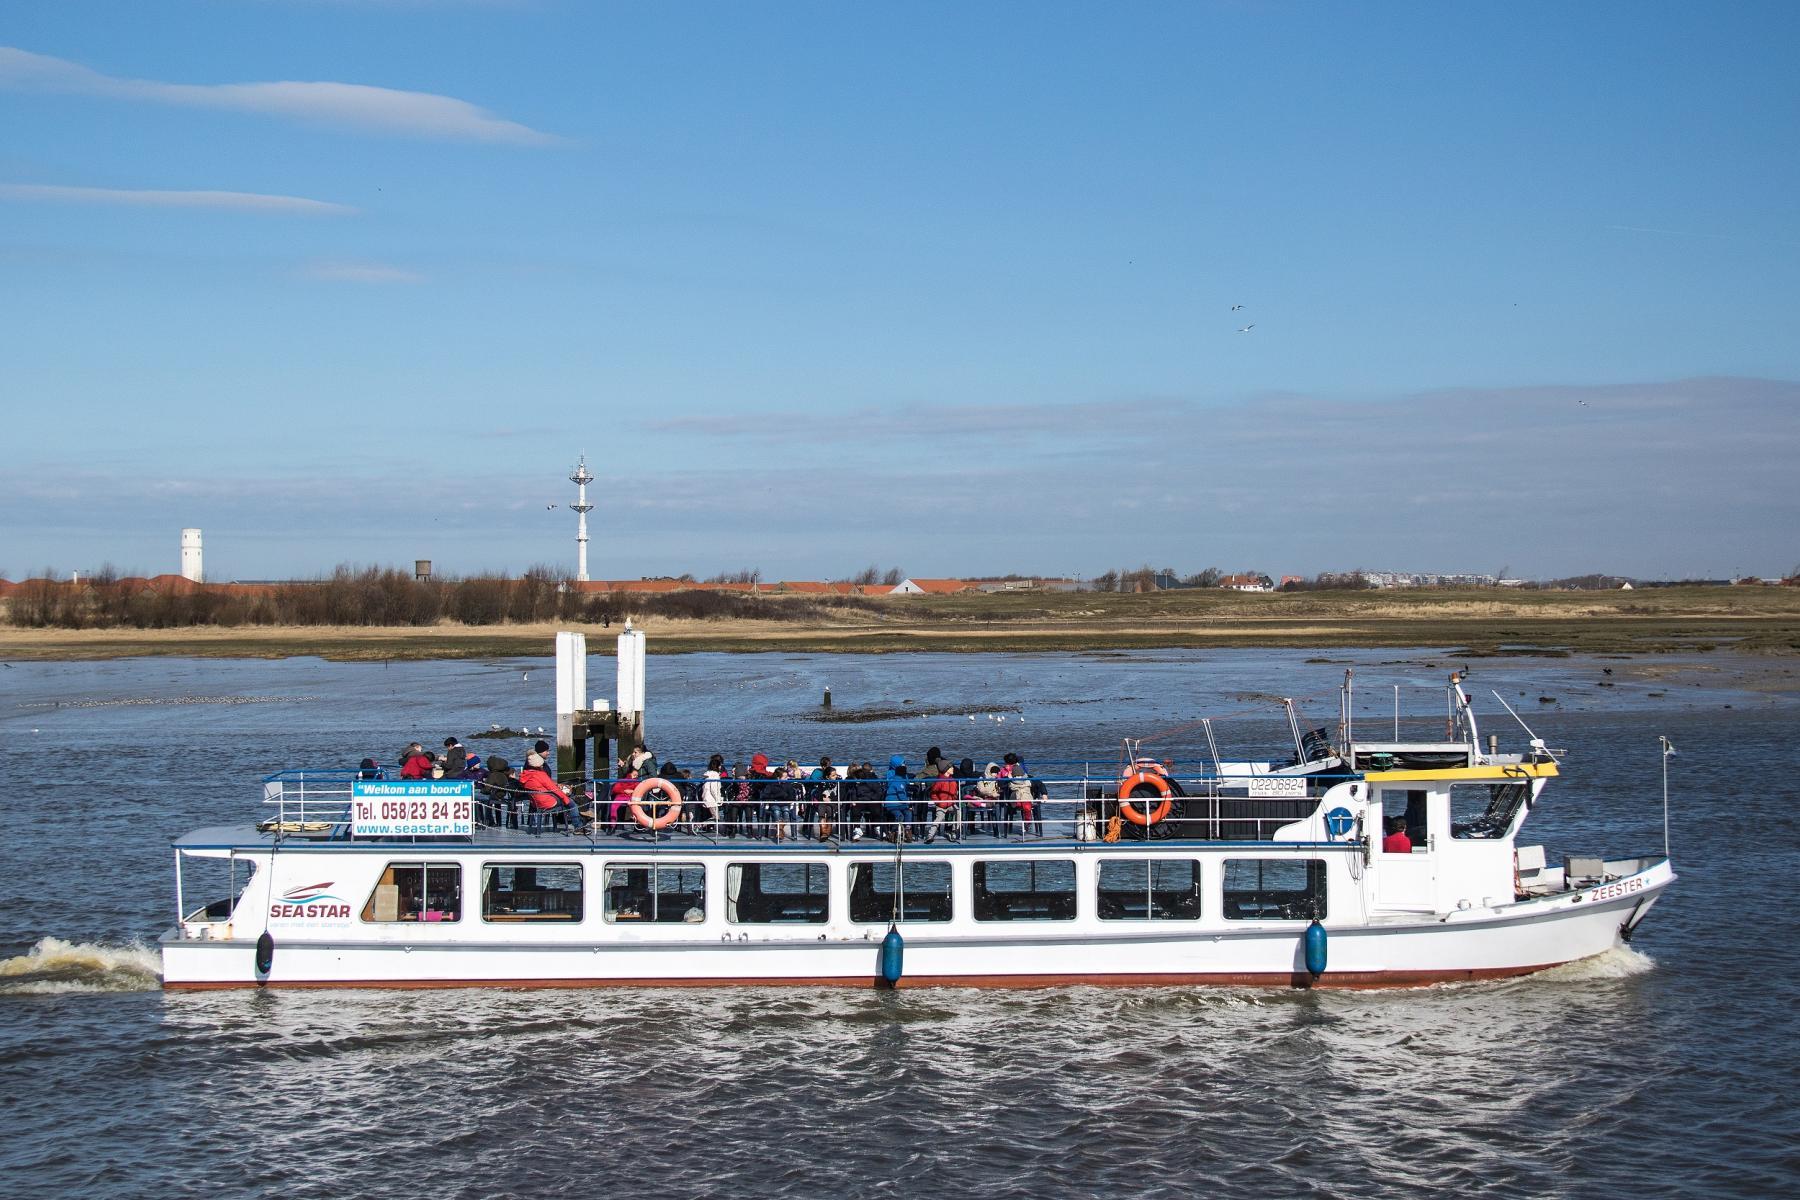 Visit Nieuwpoort Waterbeleving rederij Seastar